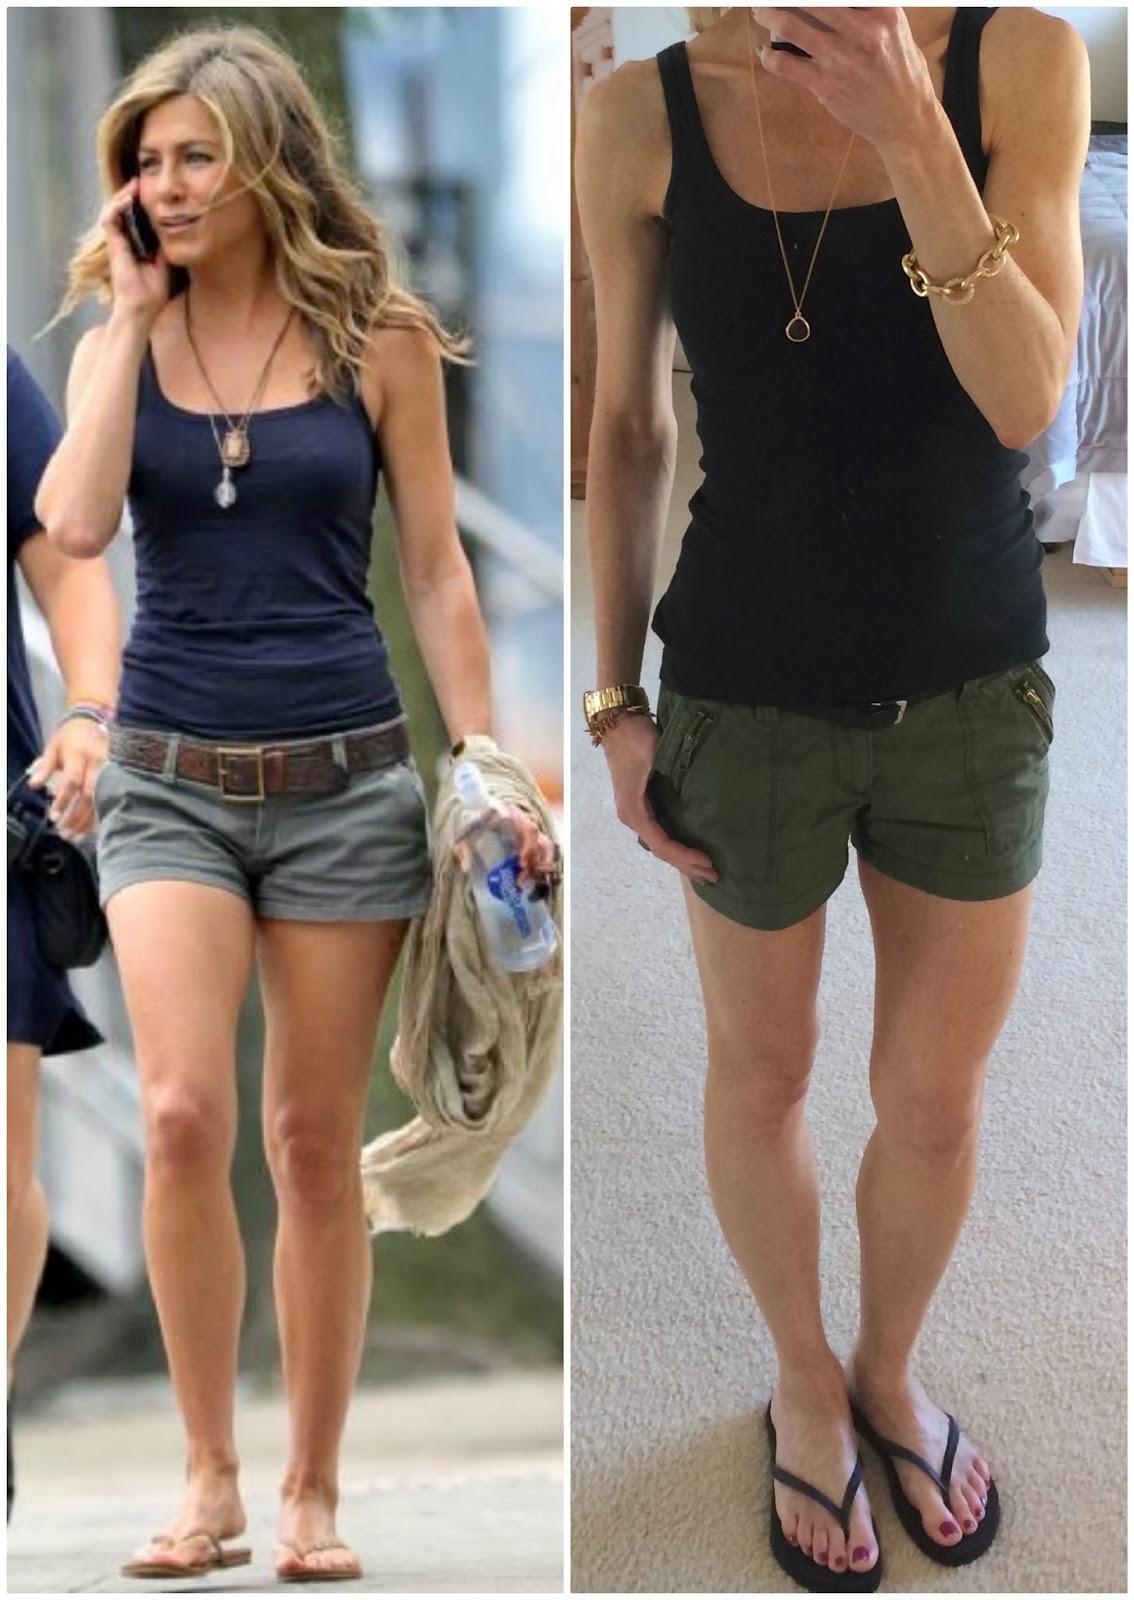 Jennifer Aniston copycat outfit, duplicate, black tank top, olive shorts